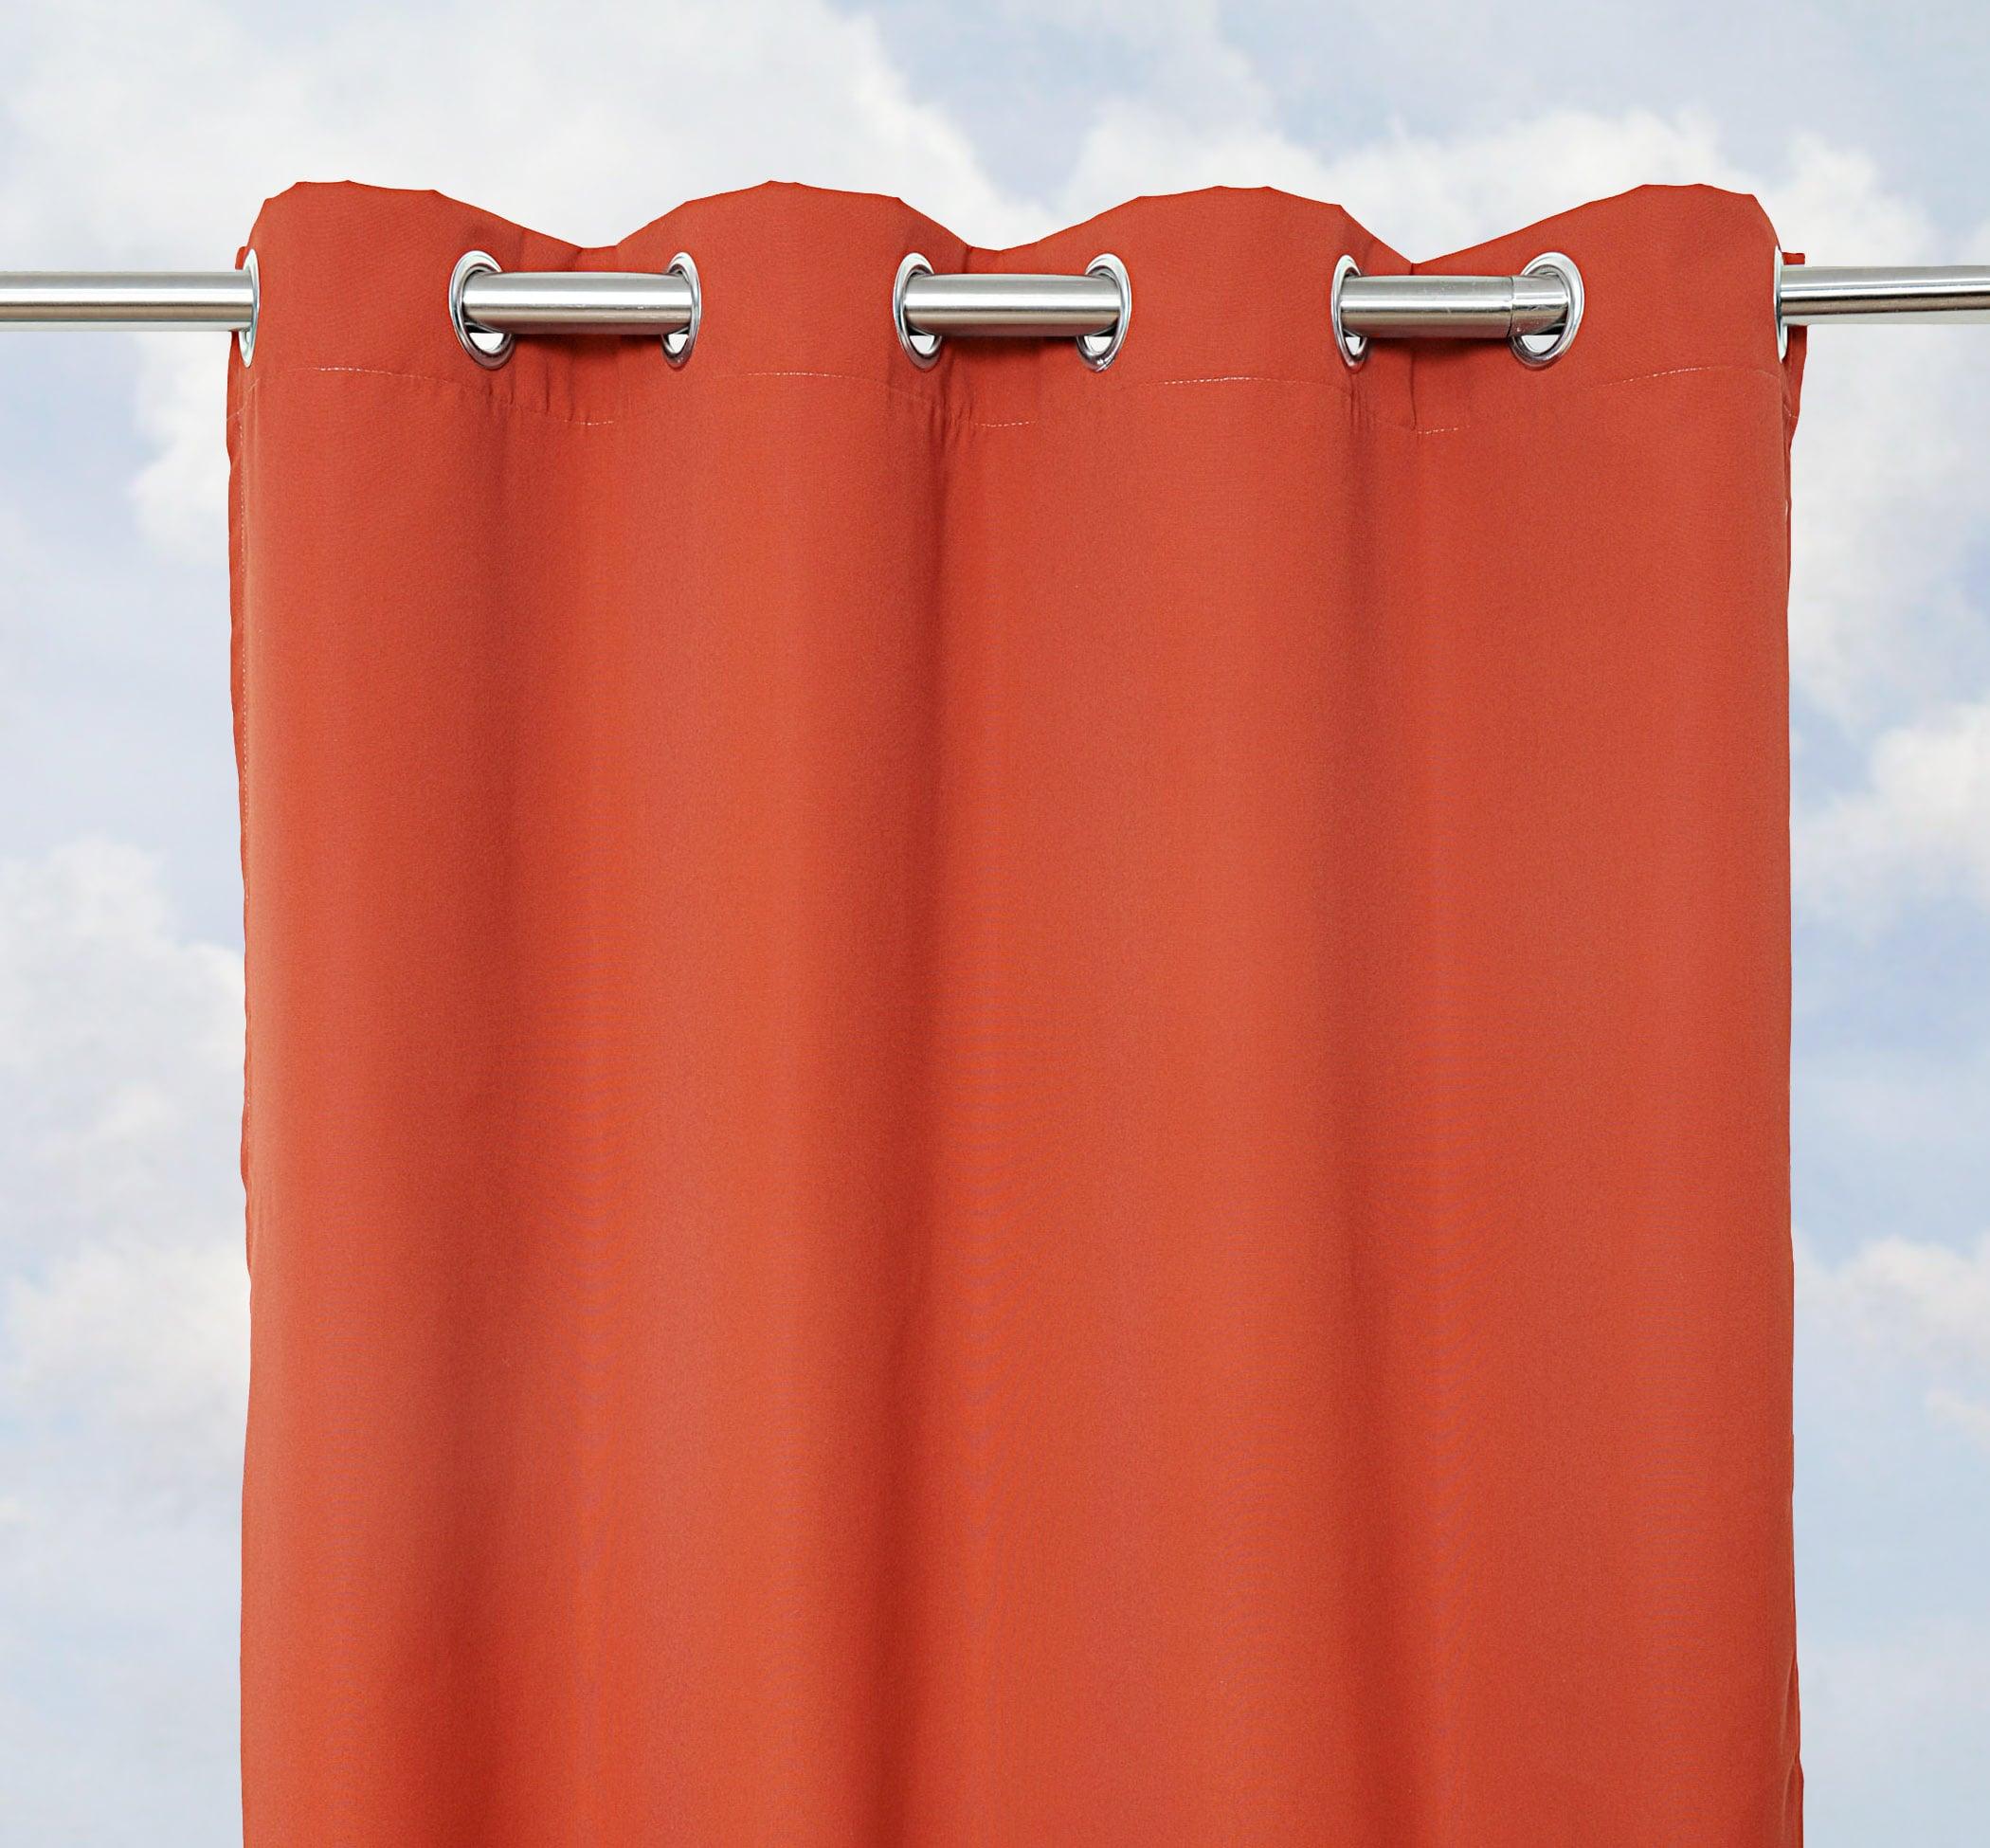 Sunbrella Bay View Terracotta 96-inch Outdoor Curtain Panel - 14284459 ...